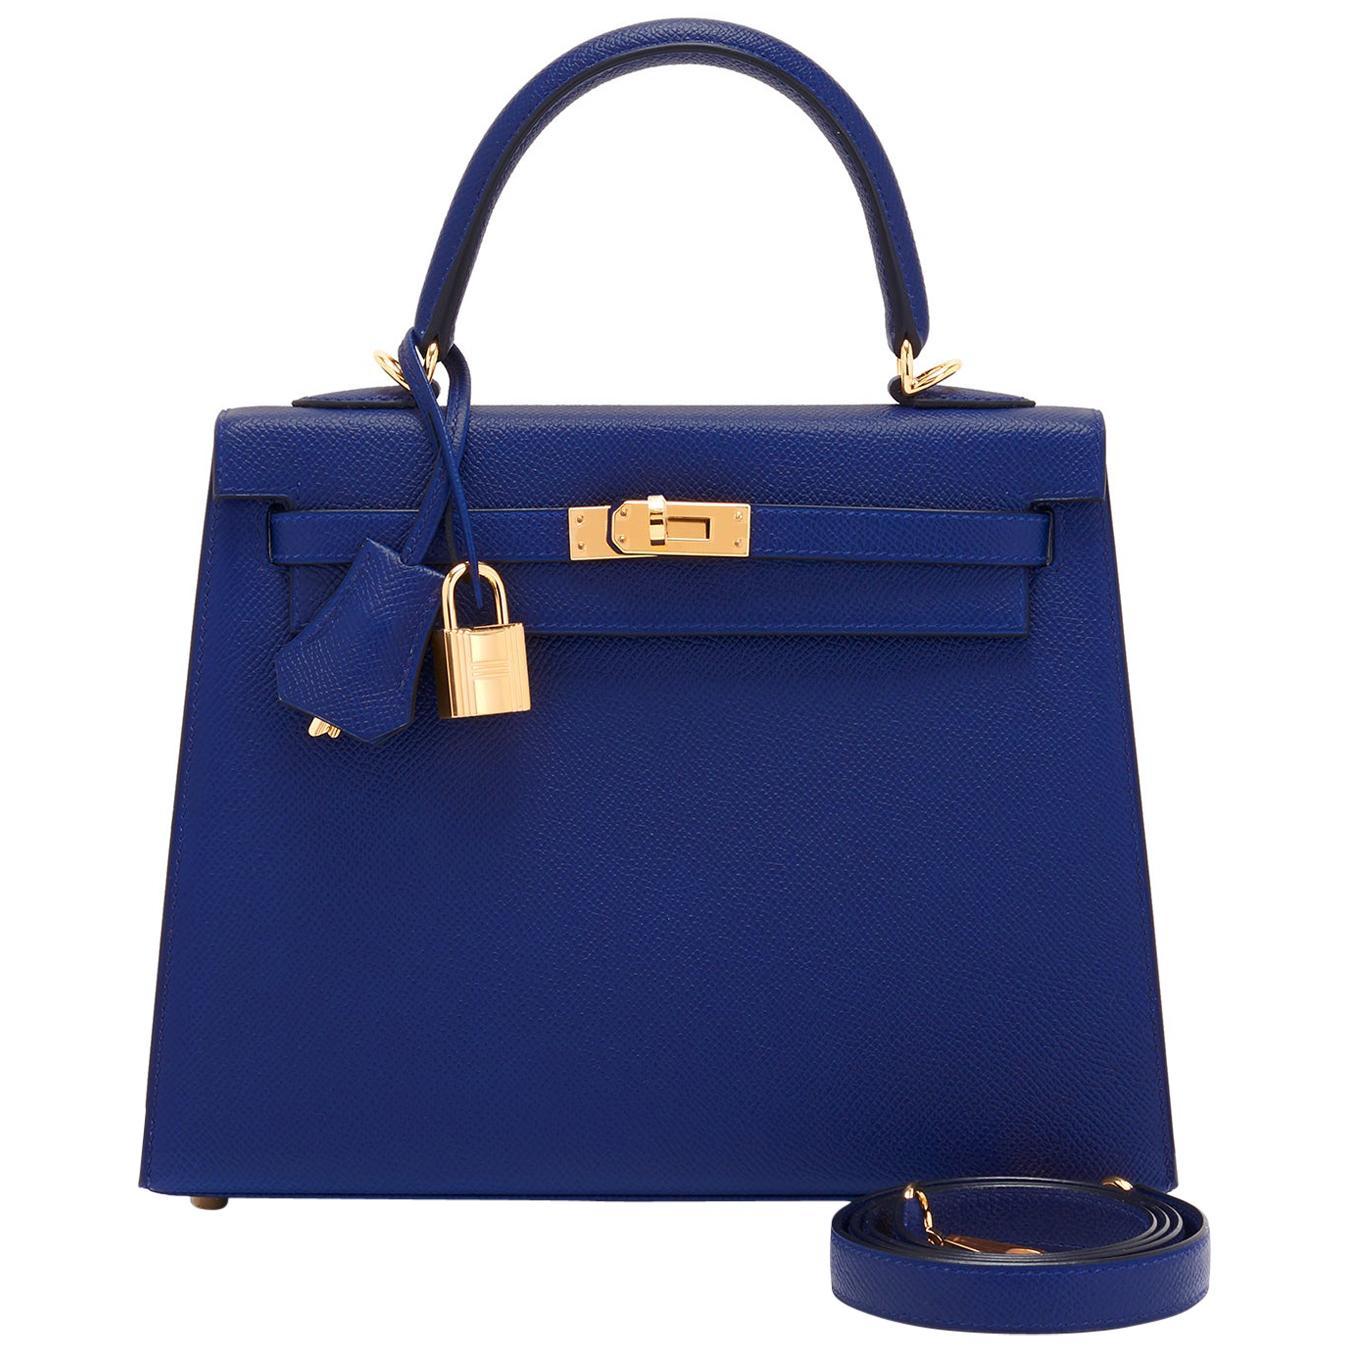 Hermes Kelly 25cm Blue Sapphire Navy Epsom Sellier Bag Gold Y Stamp, 2020